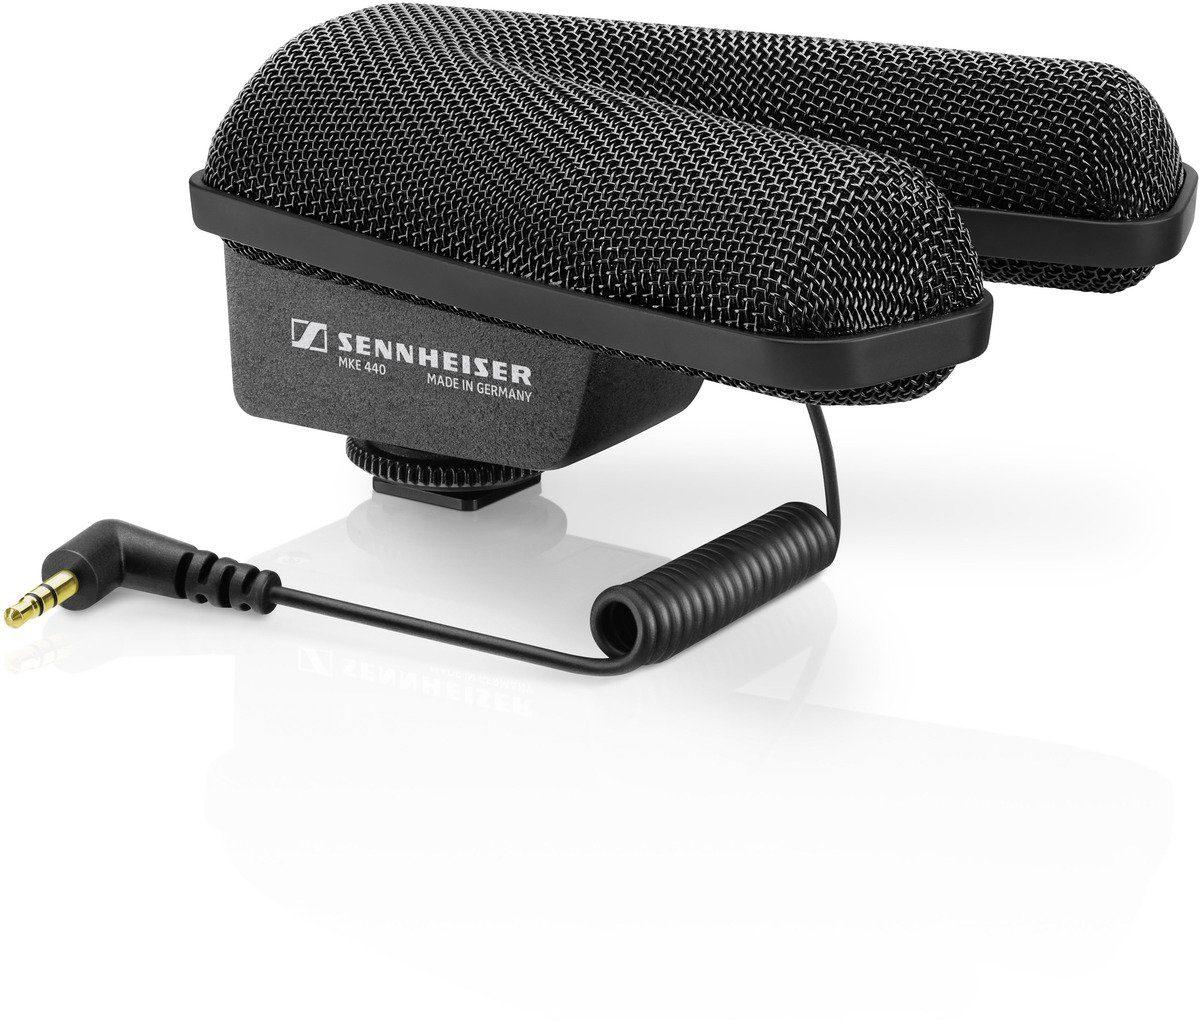 Sennheiser Zubehör »Stereo Kameramikrofon MKE 440«